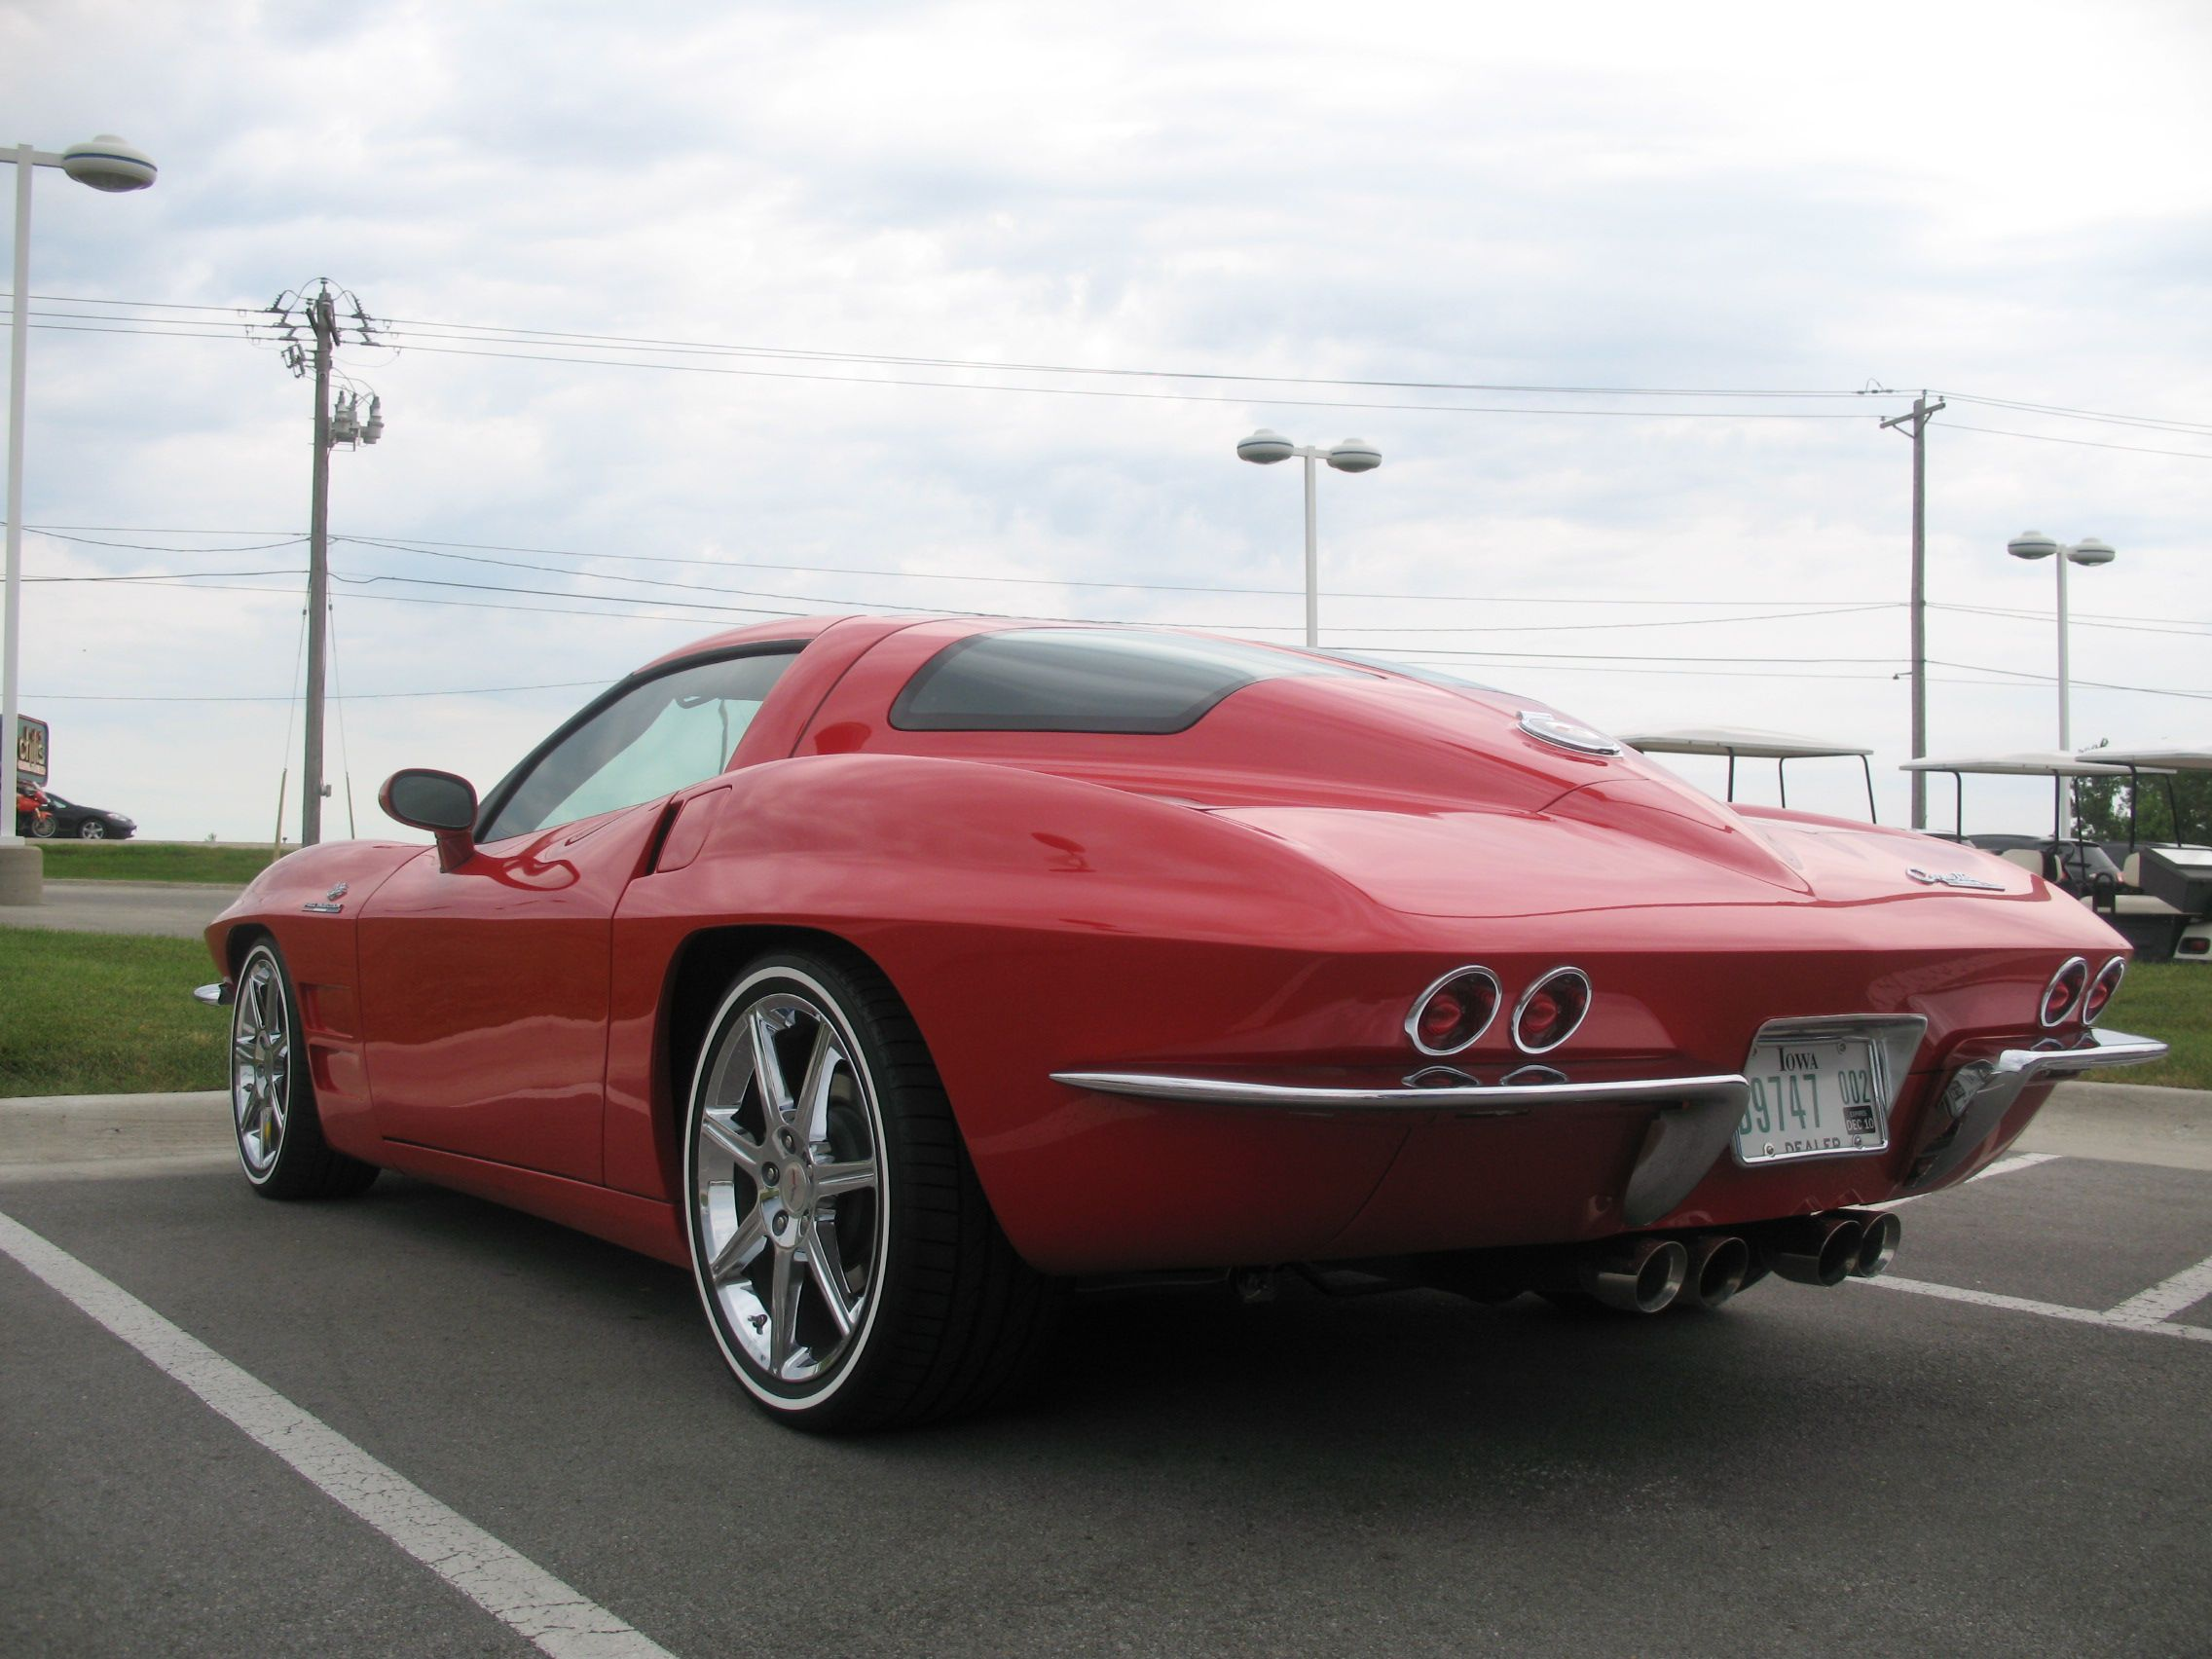 Karl Kustoms New Chevy Used Cars Chevrolet